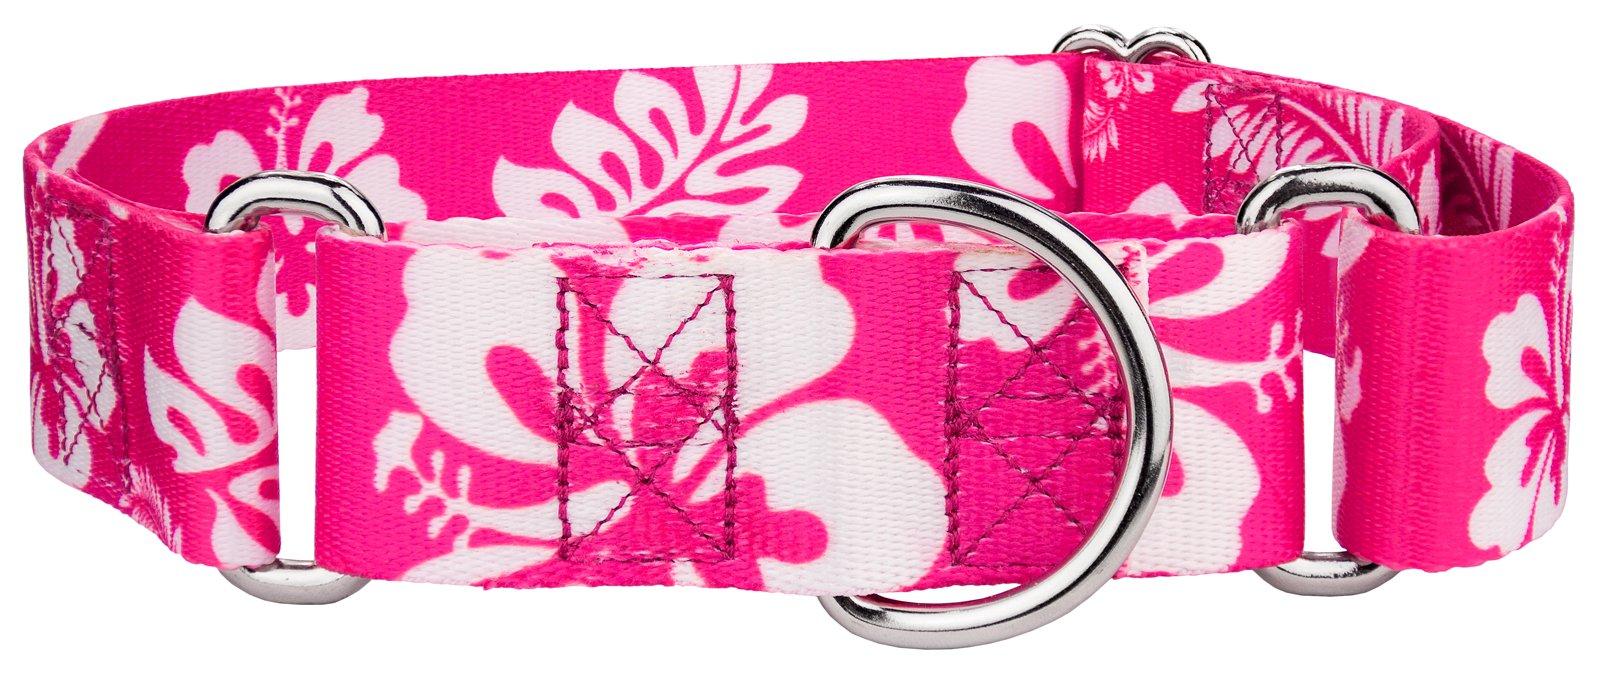 Country Brook Petz 1 1/2 Inch Pink Hawaiian Martingale Dog Collar - Medium